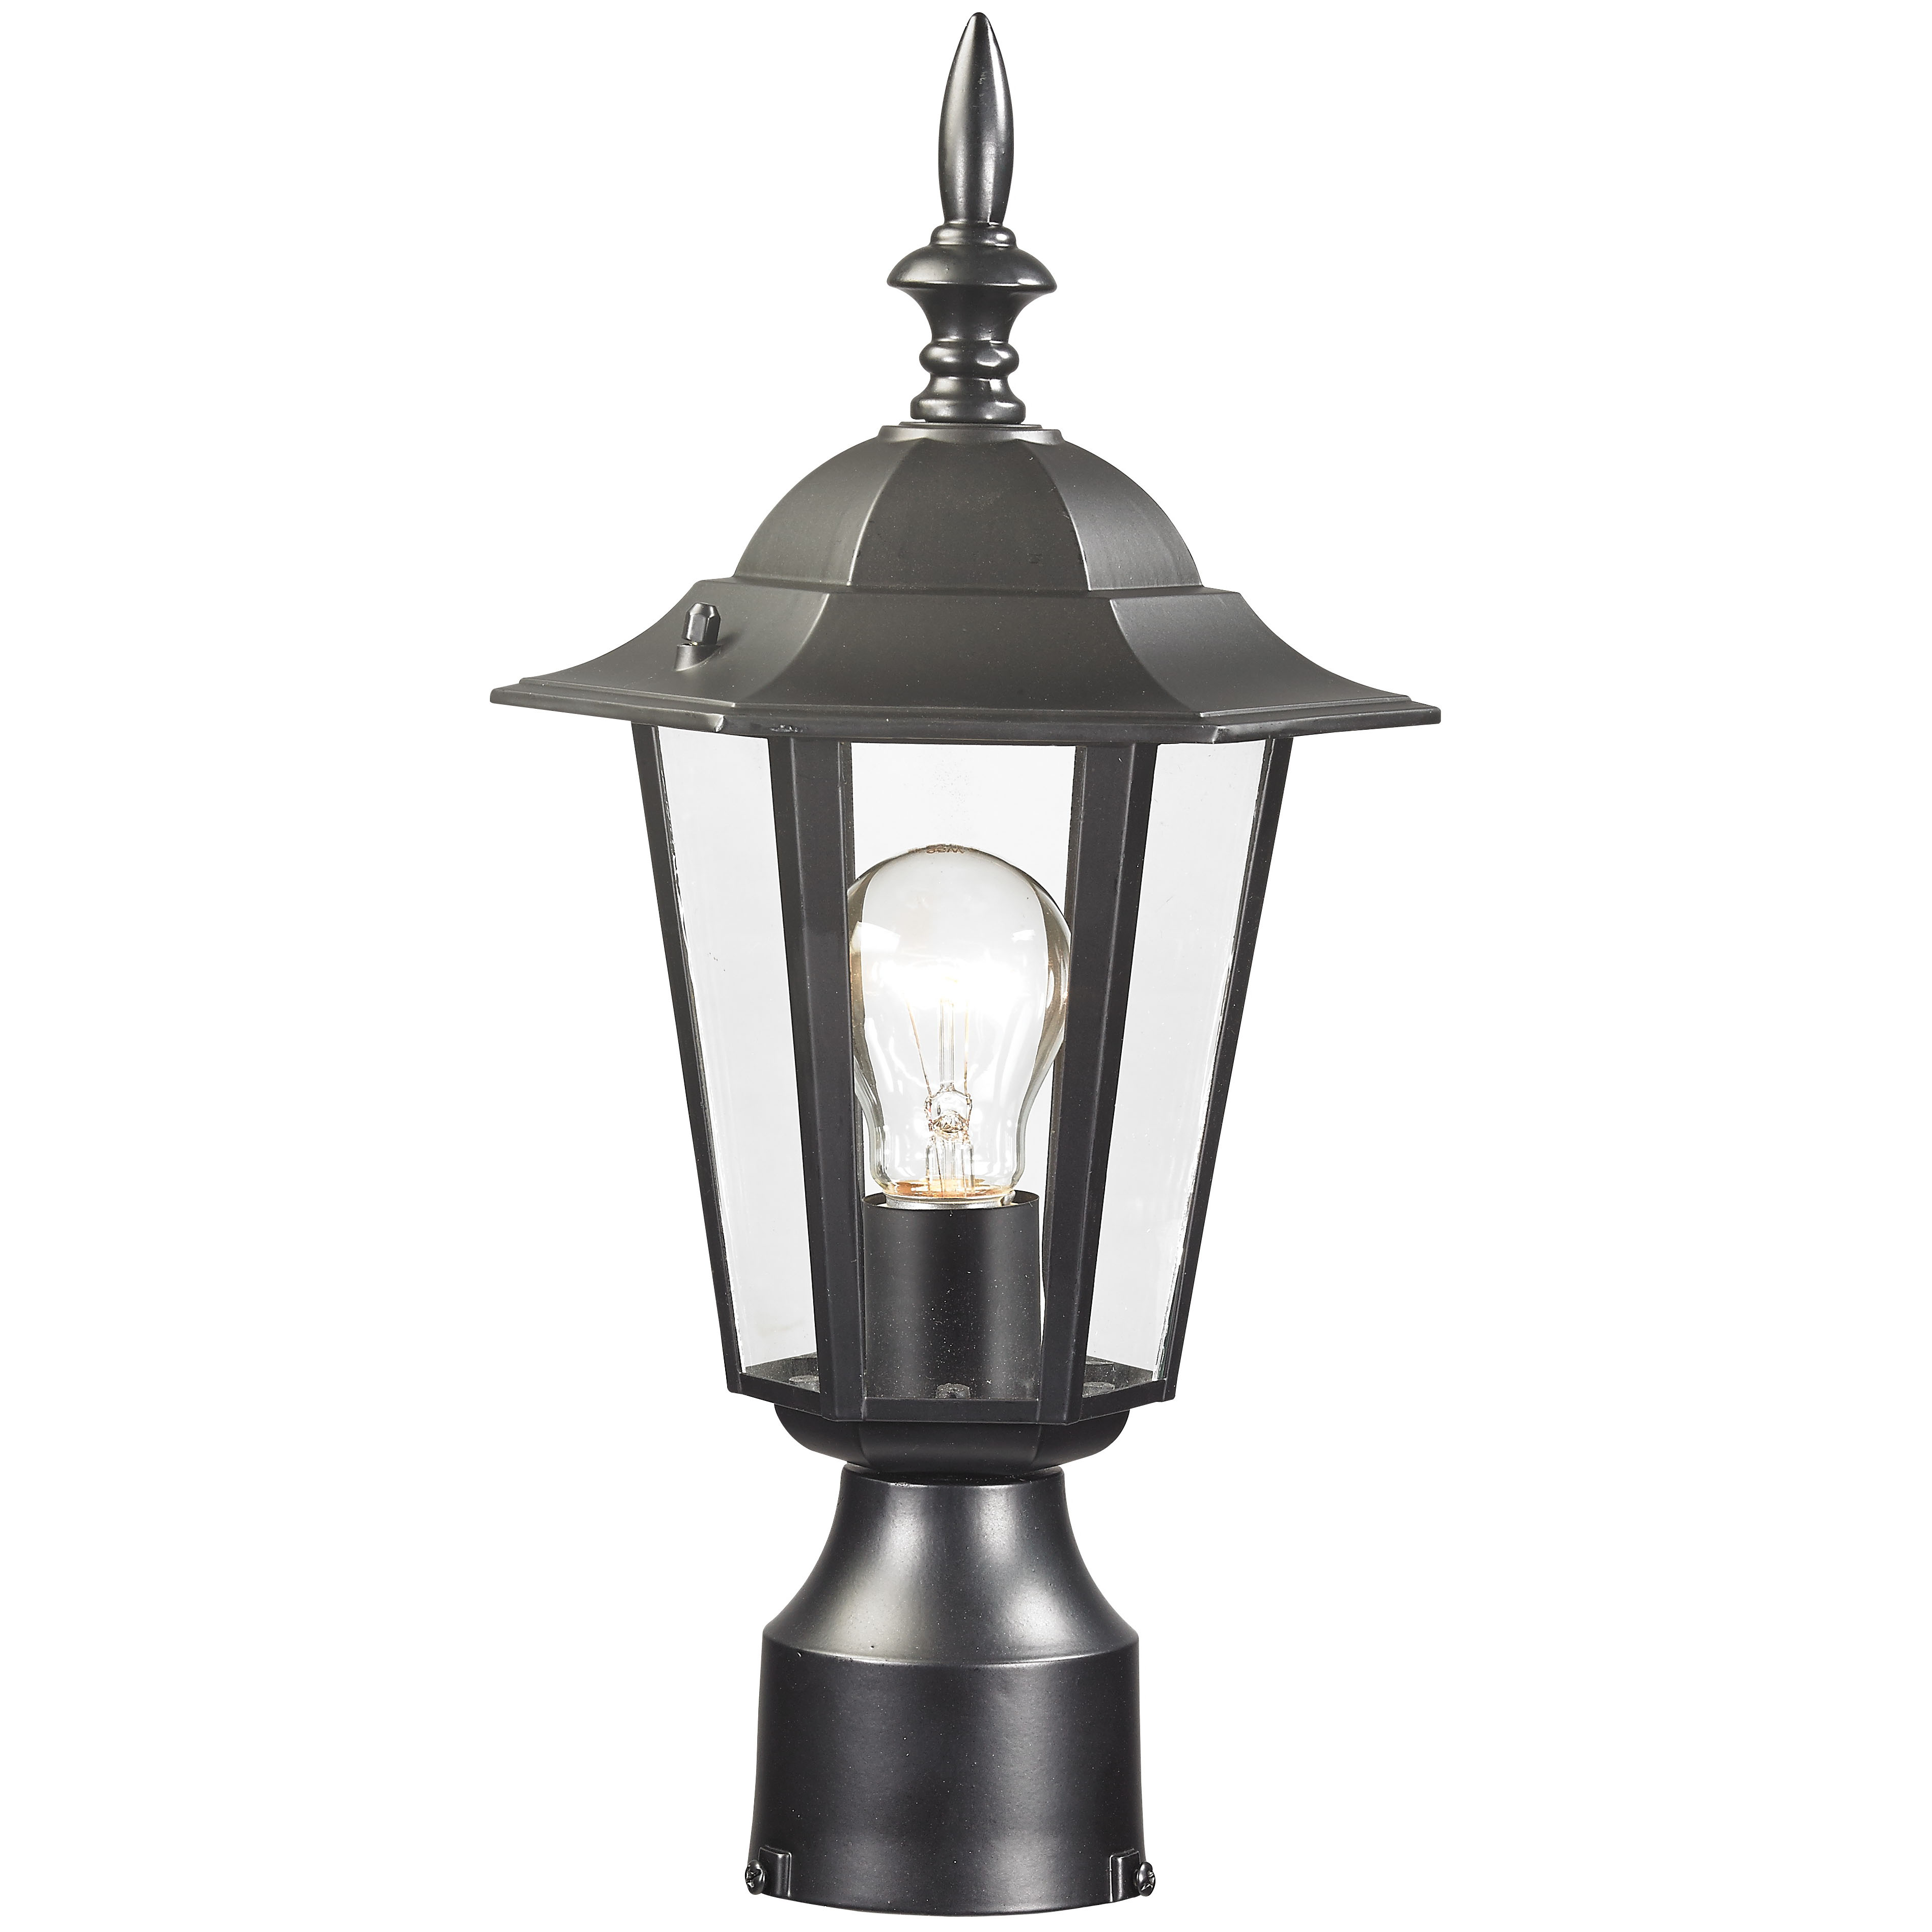 Picture of Boston Harbor AL8044-BK Post Lantern, Aluminum Fixture, Black